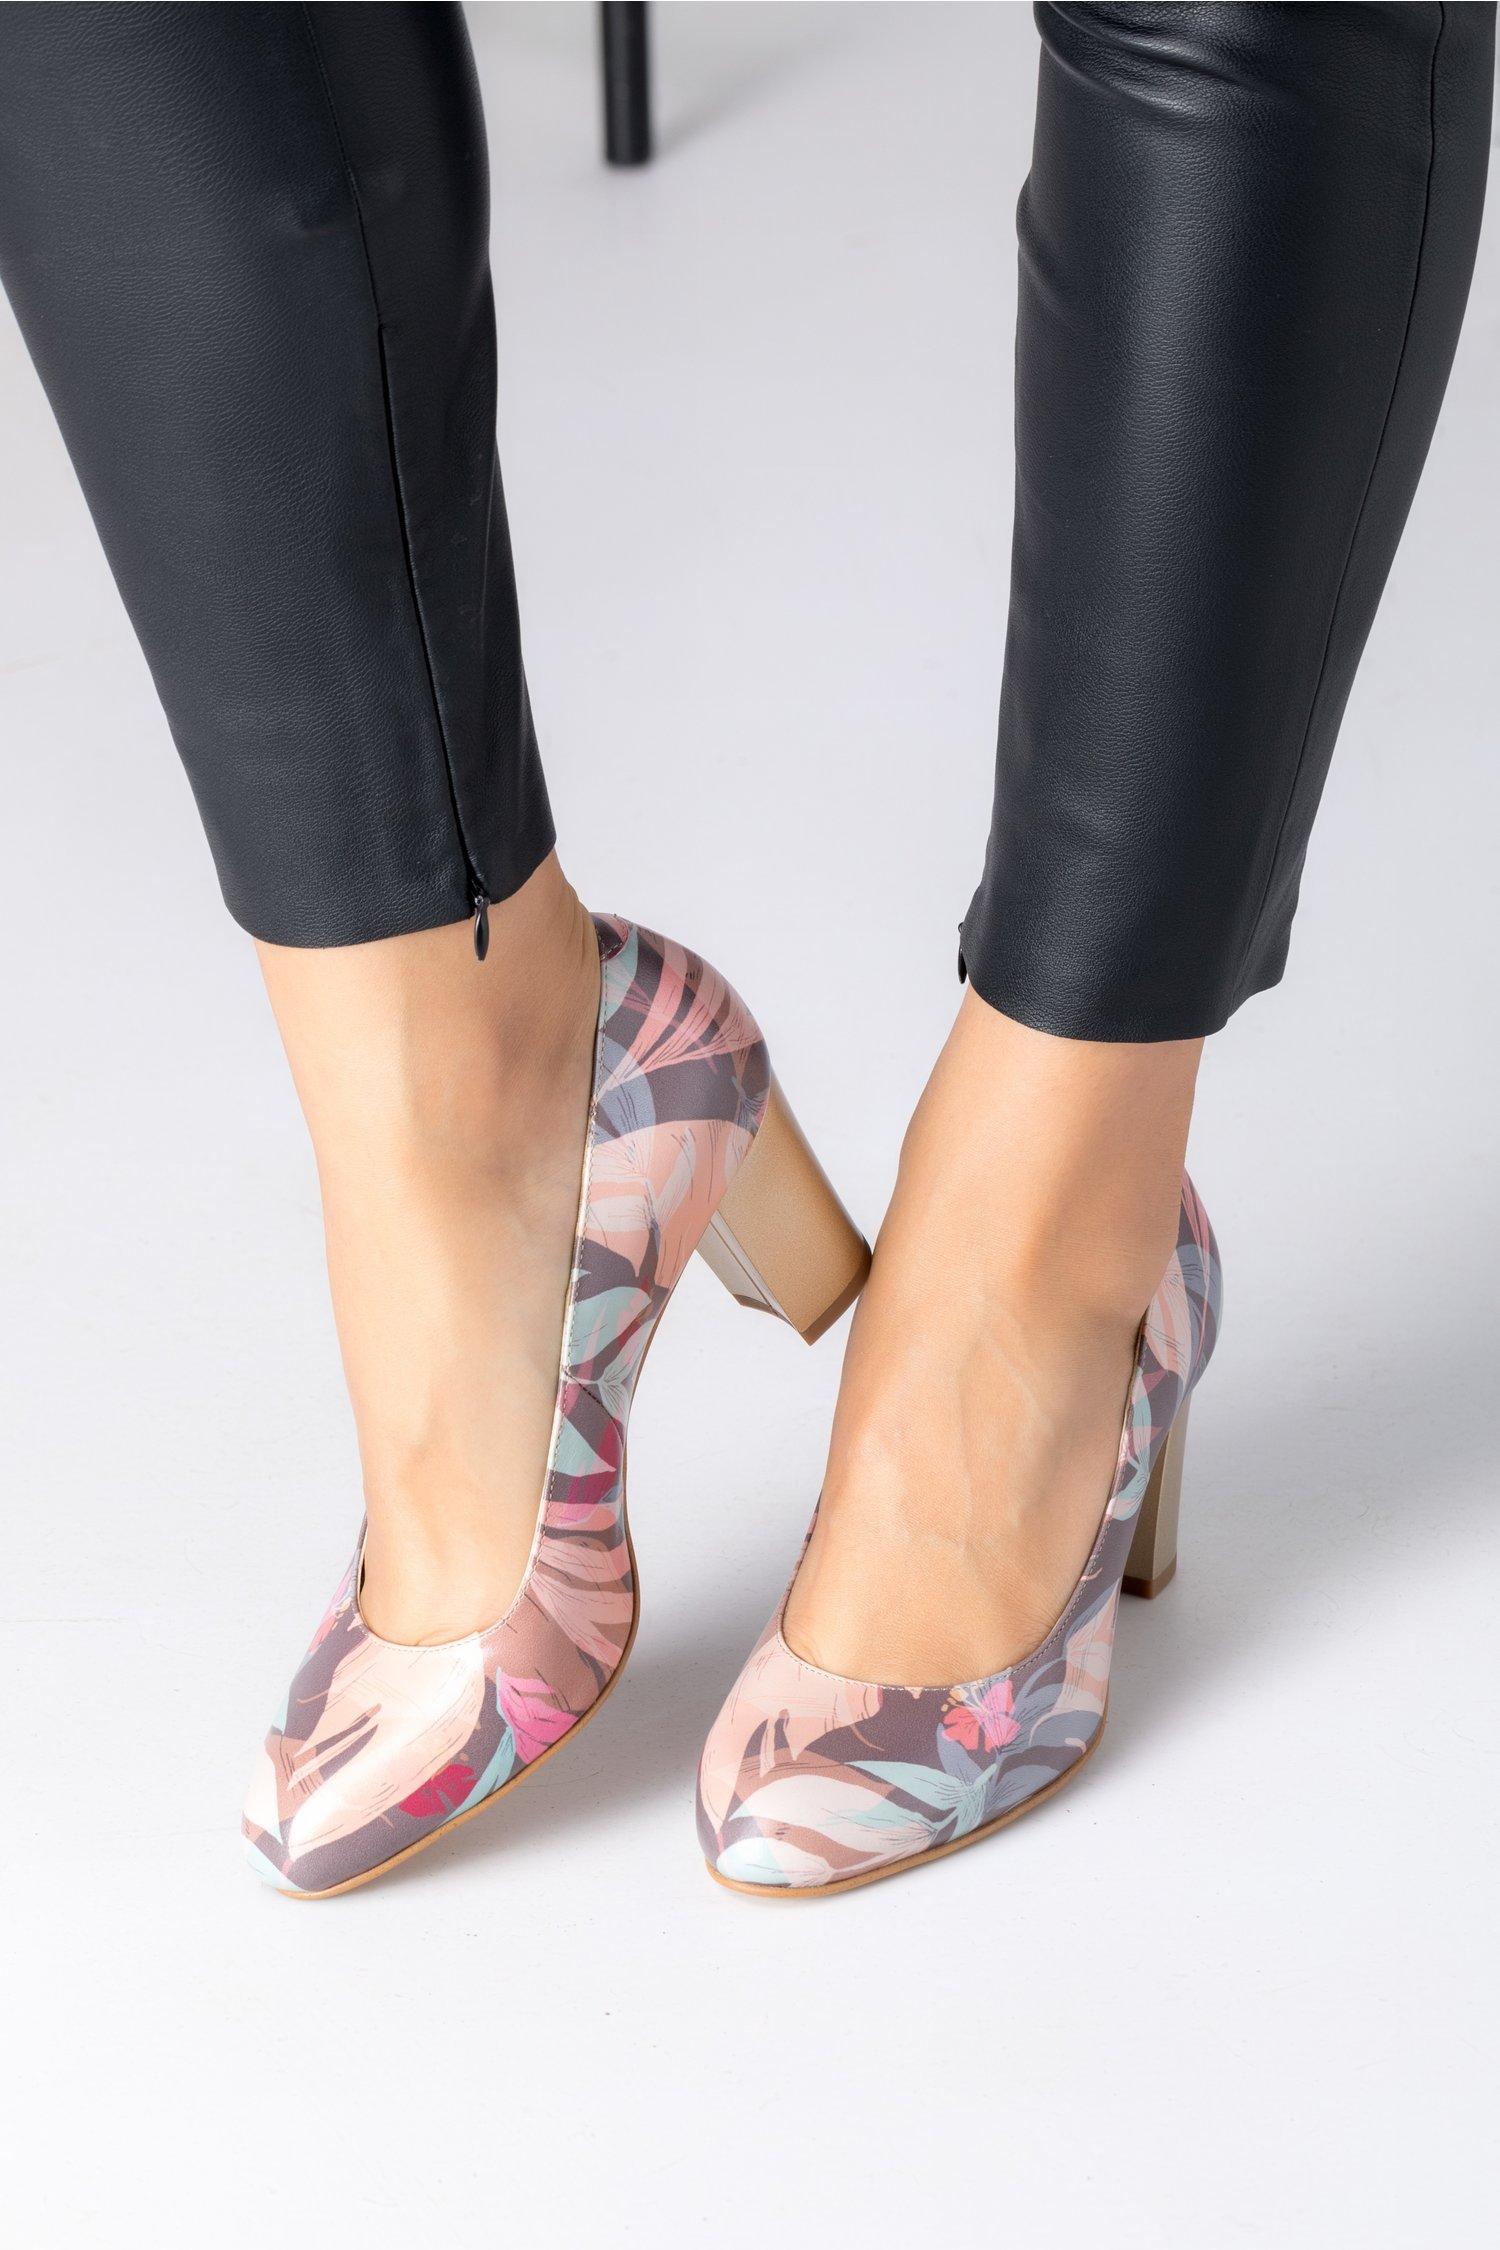 Pantofi Floris cu imprimeuri pastelate